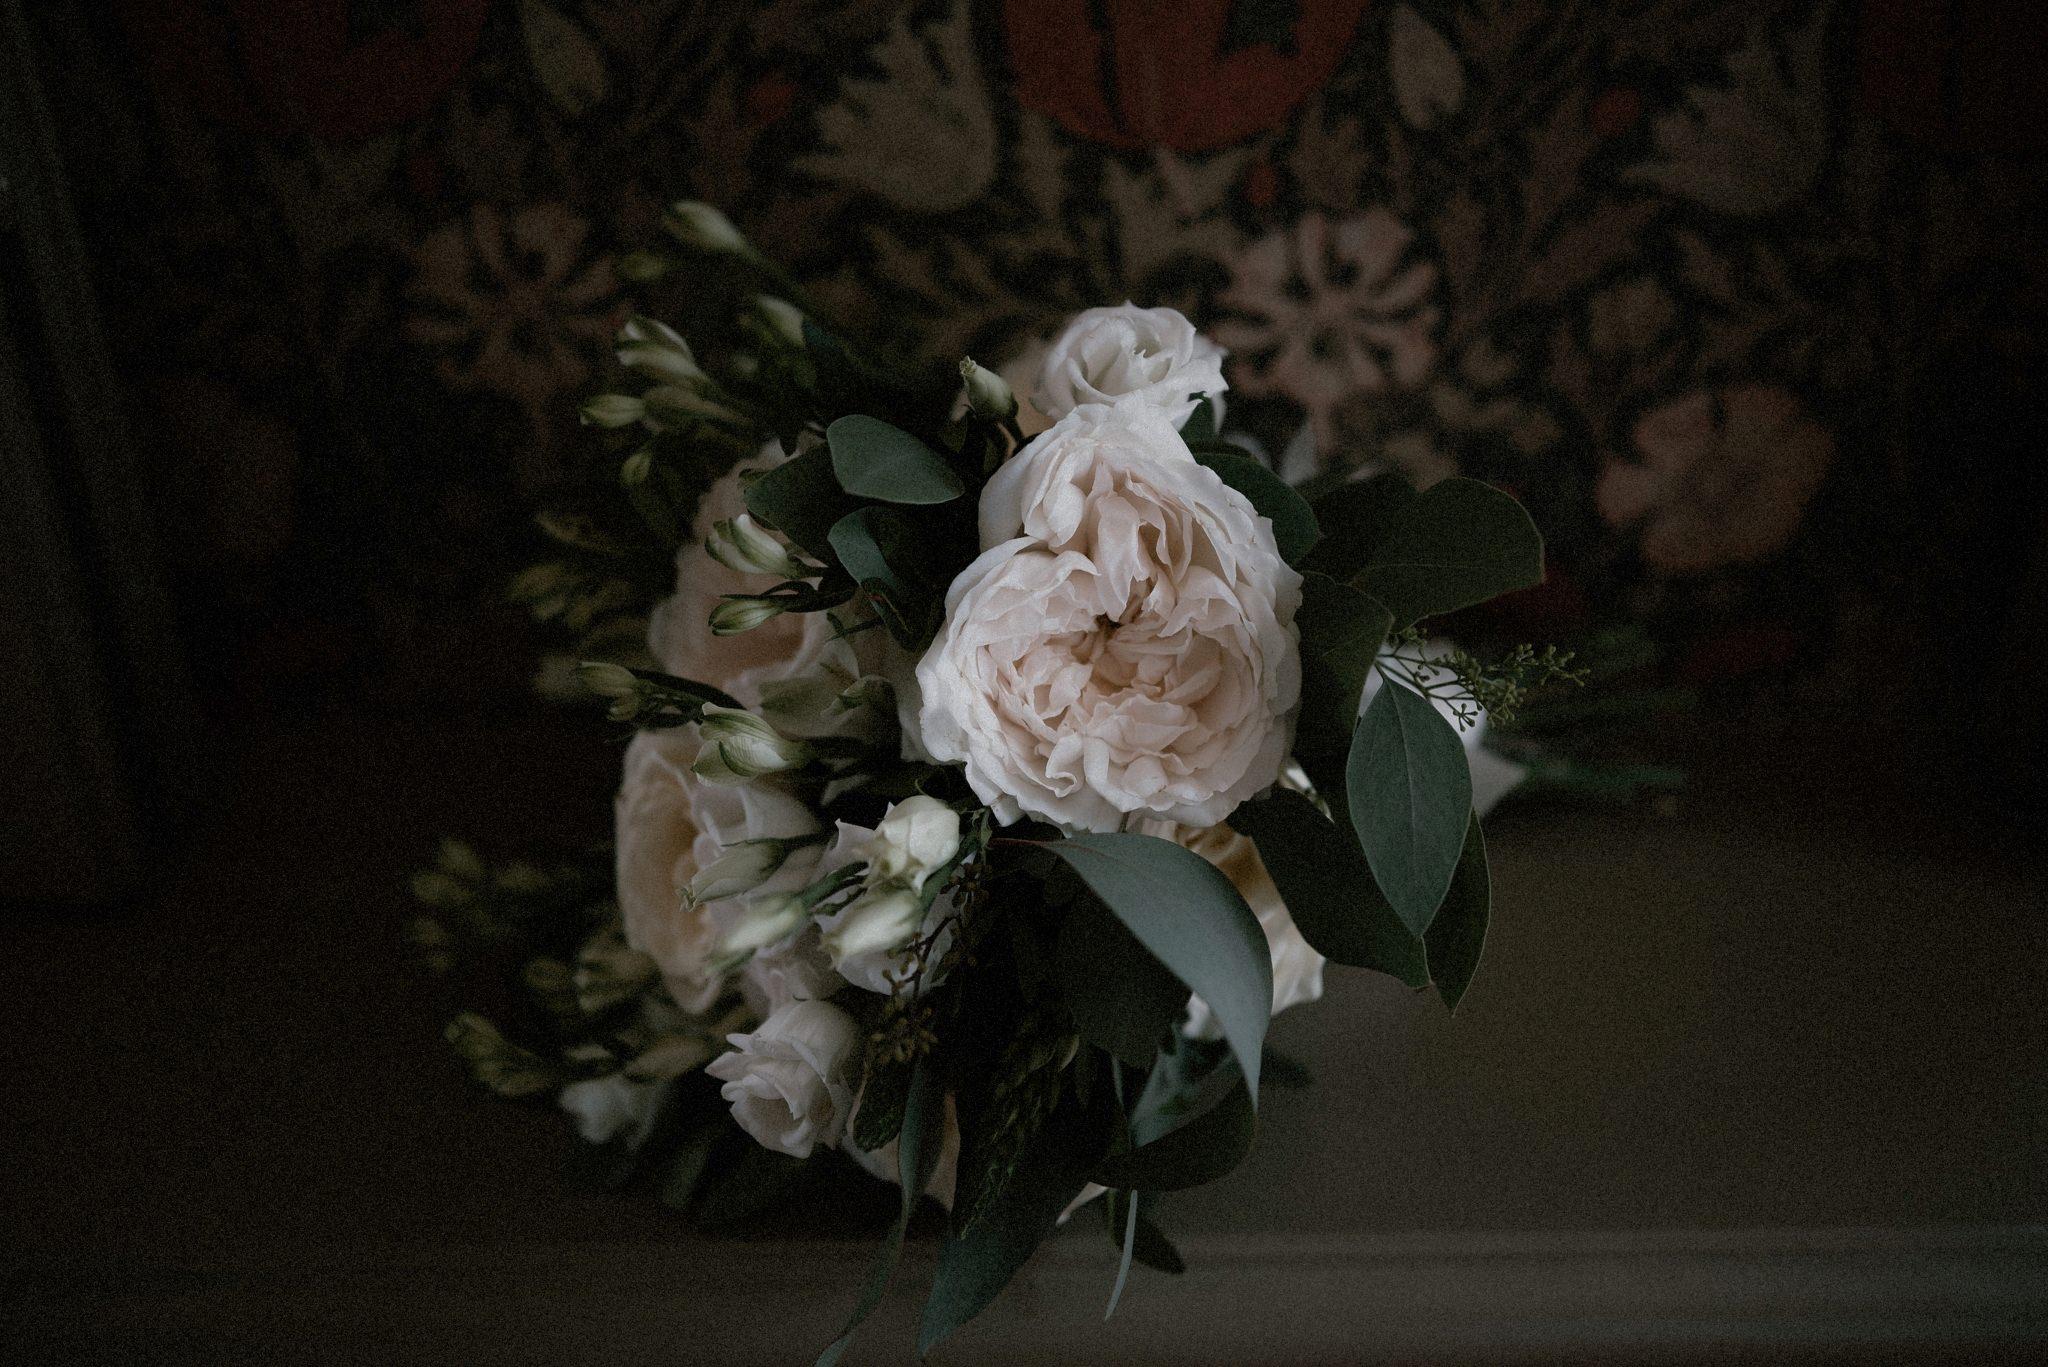 Bruidsfotografie Buitenplaats Sparrendaal - Naomi van der Kraan 0008.jpg